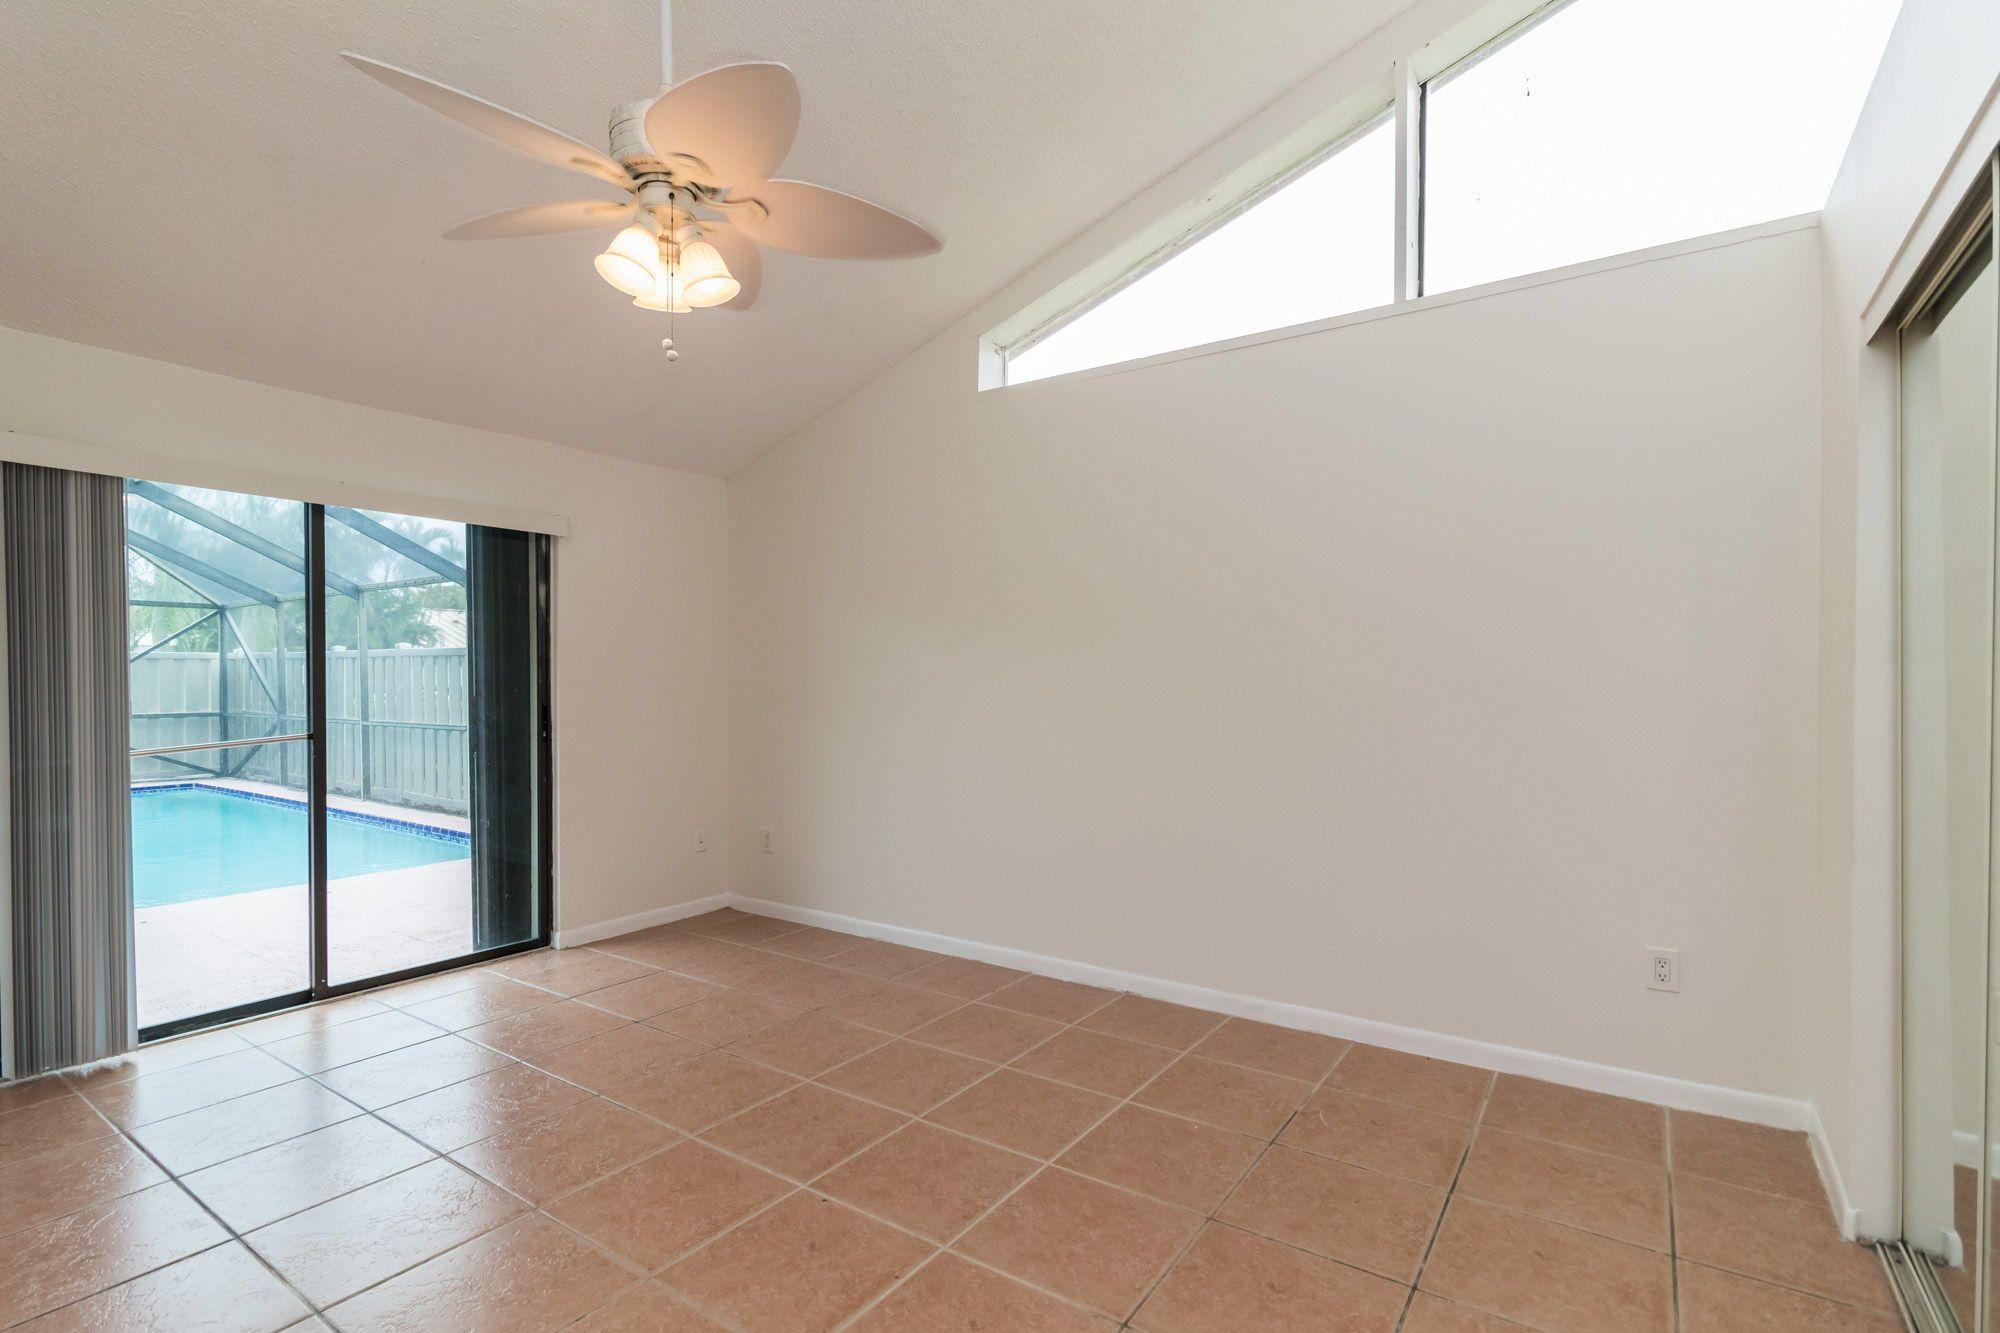 341156bb3811c5f3b0f40a8ec5e29505 - Rooms For Rent Palm Beach Gardens Fl